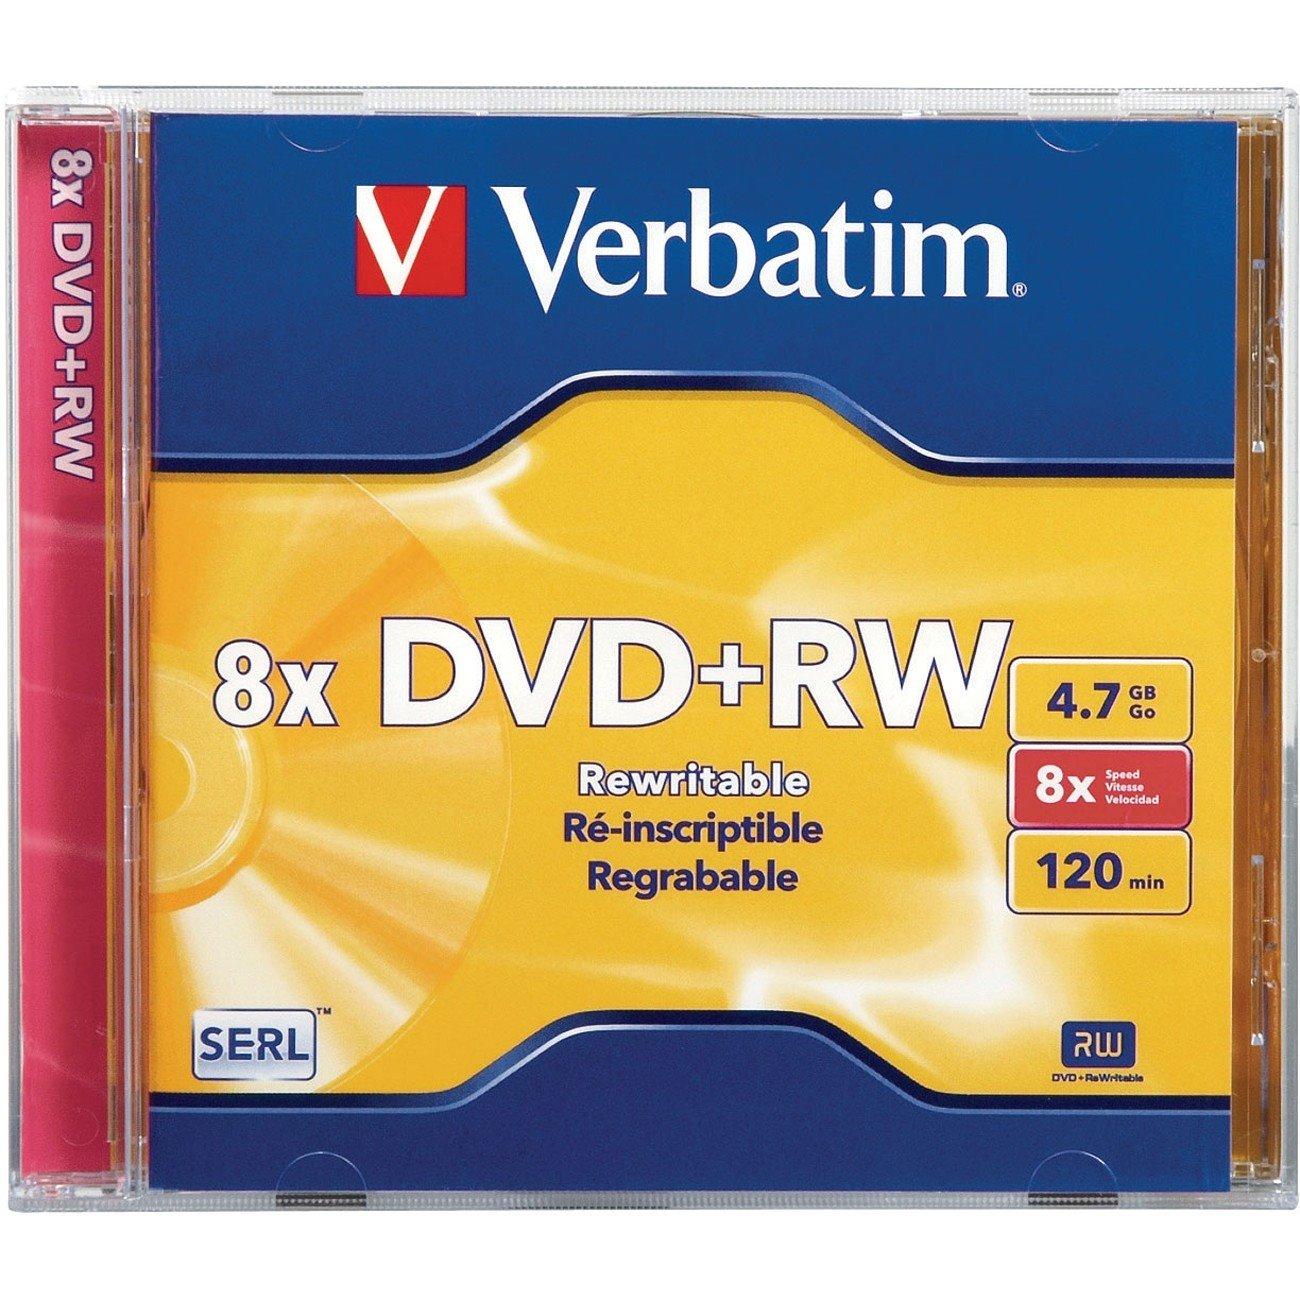 Verbatim 95071 DVD Rewritable Media - DVD+RW - 8x - 4.70 GB - 1 Pack Jewel Case